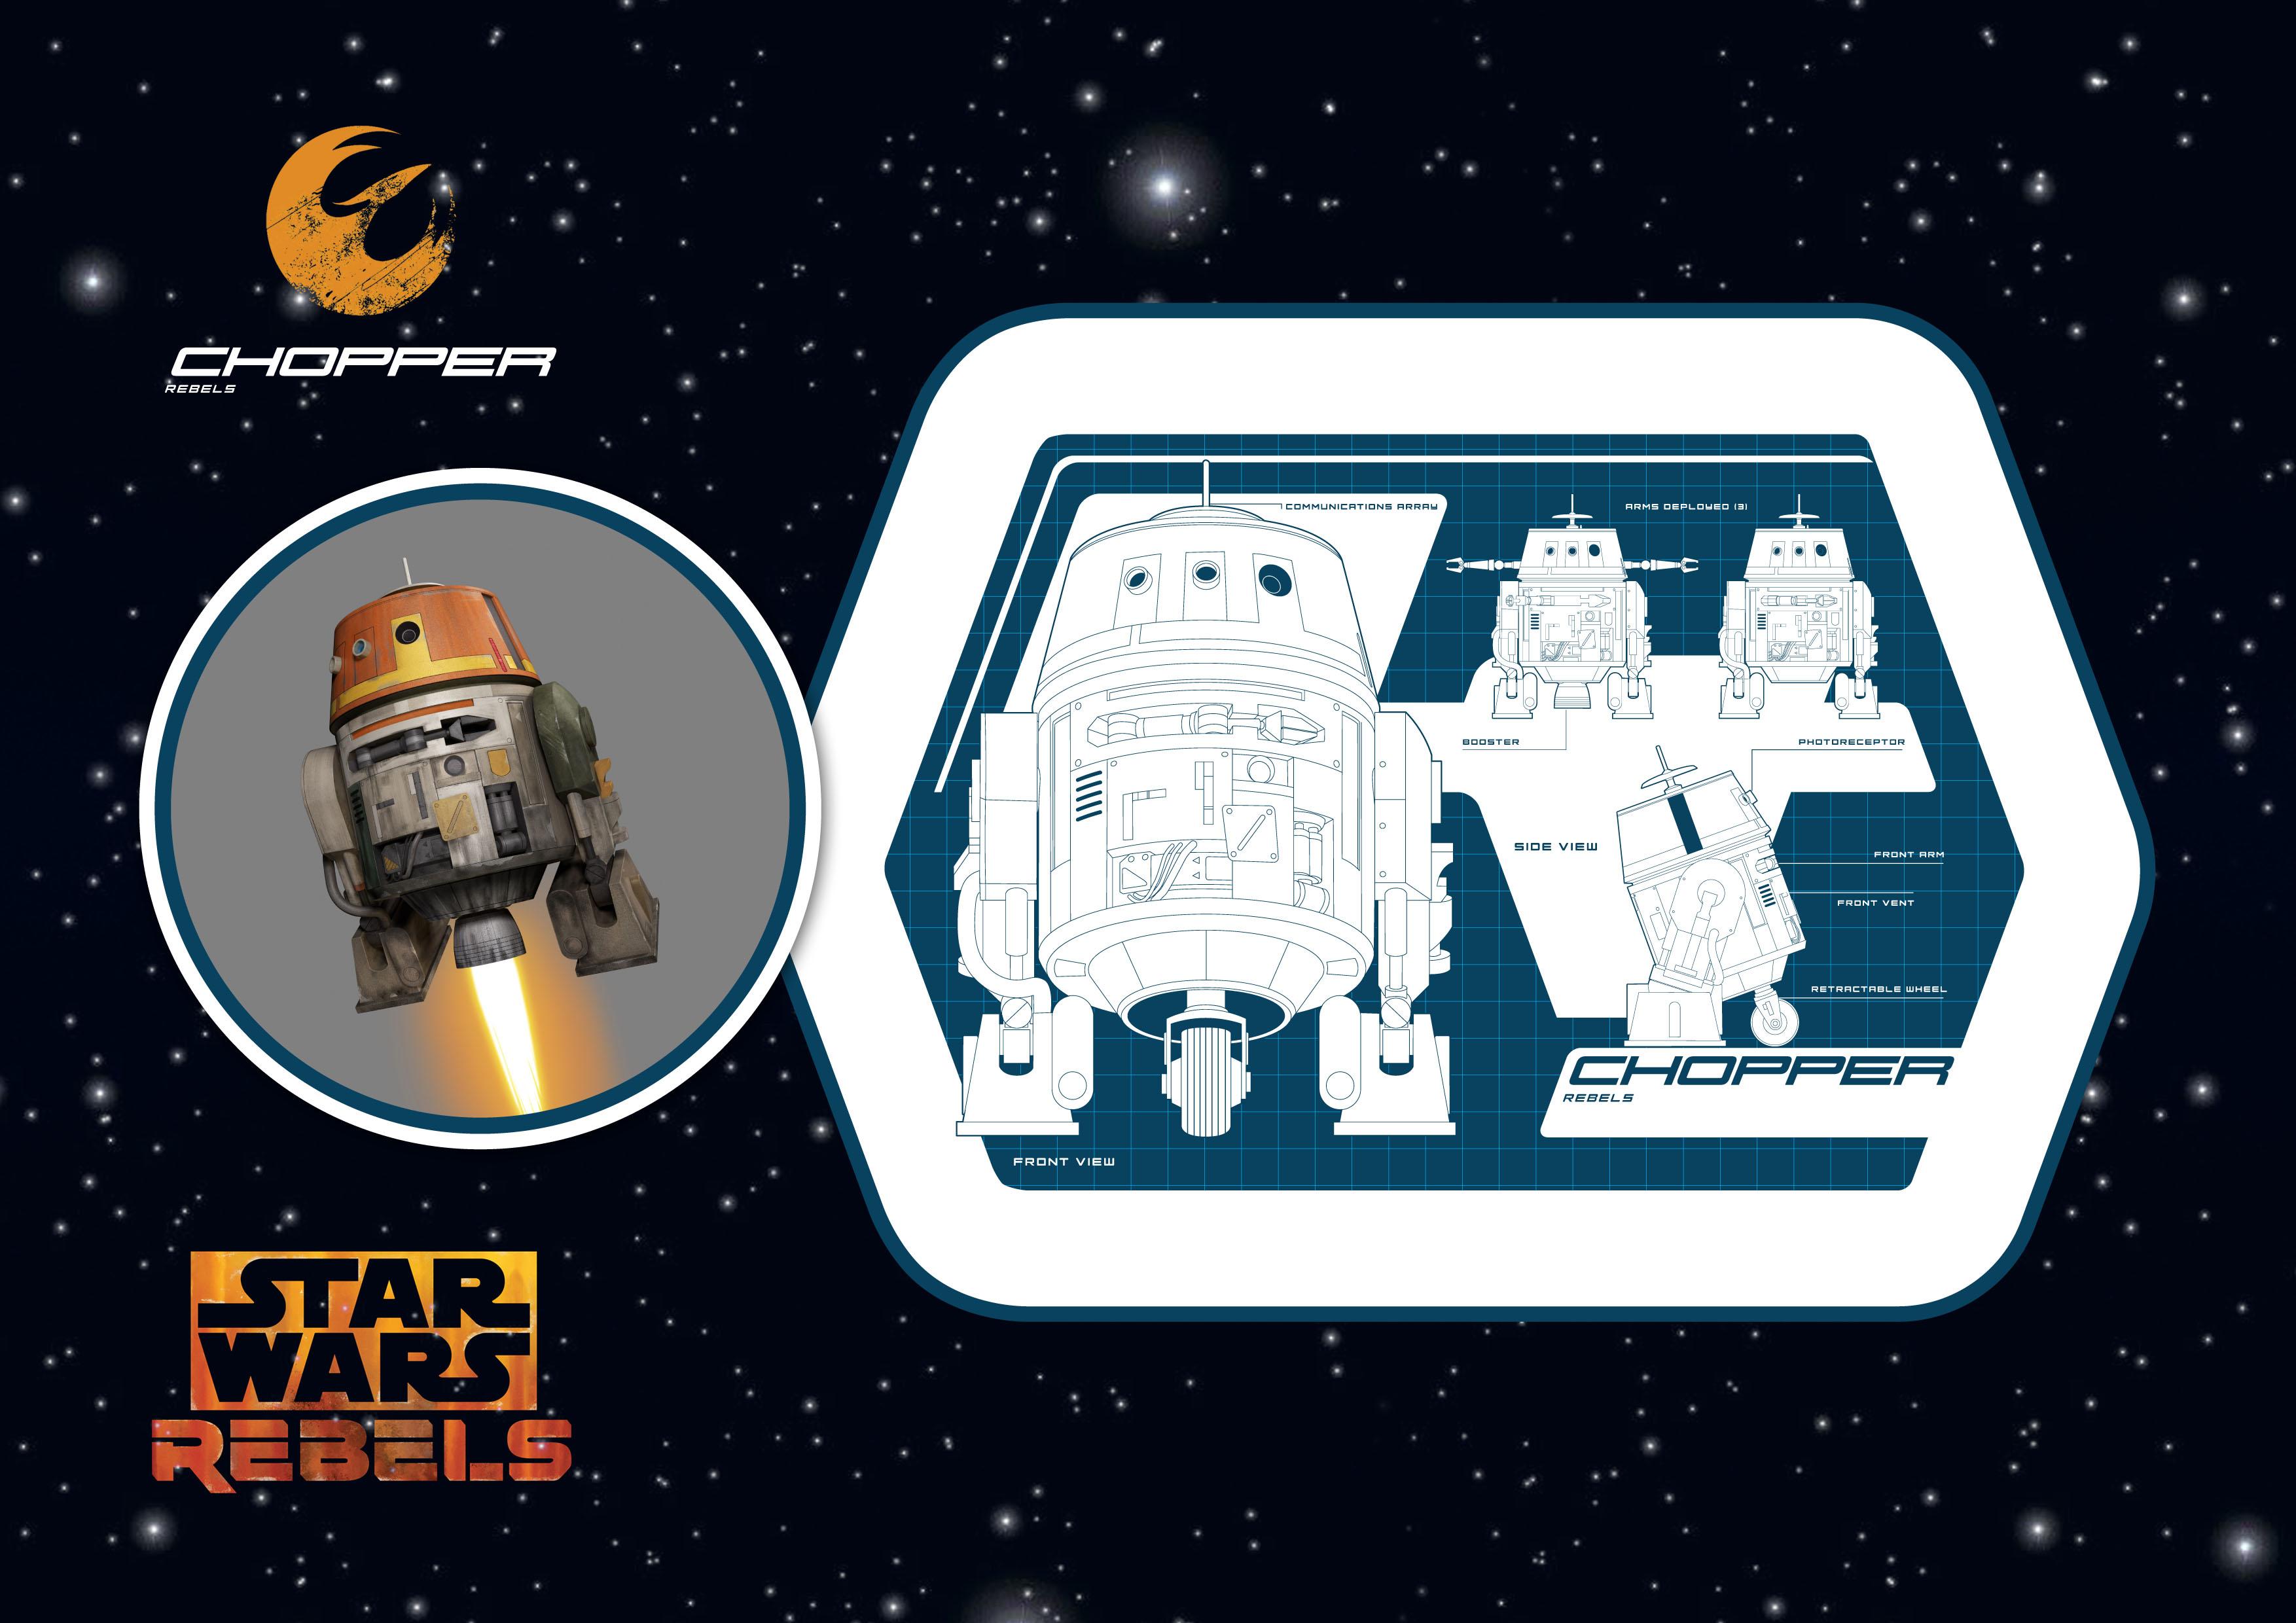 Star wars rebels - stagione 1